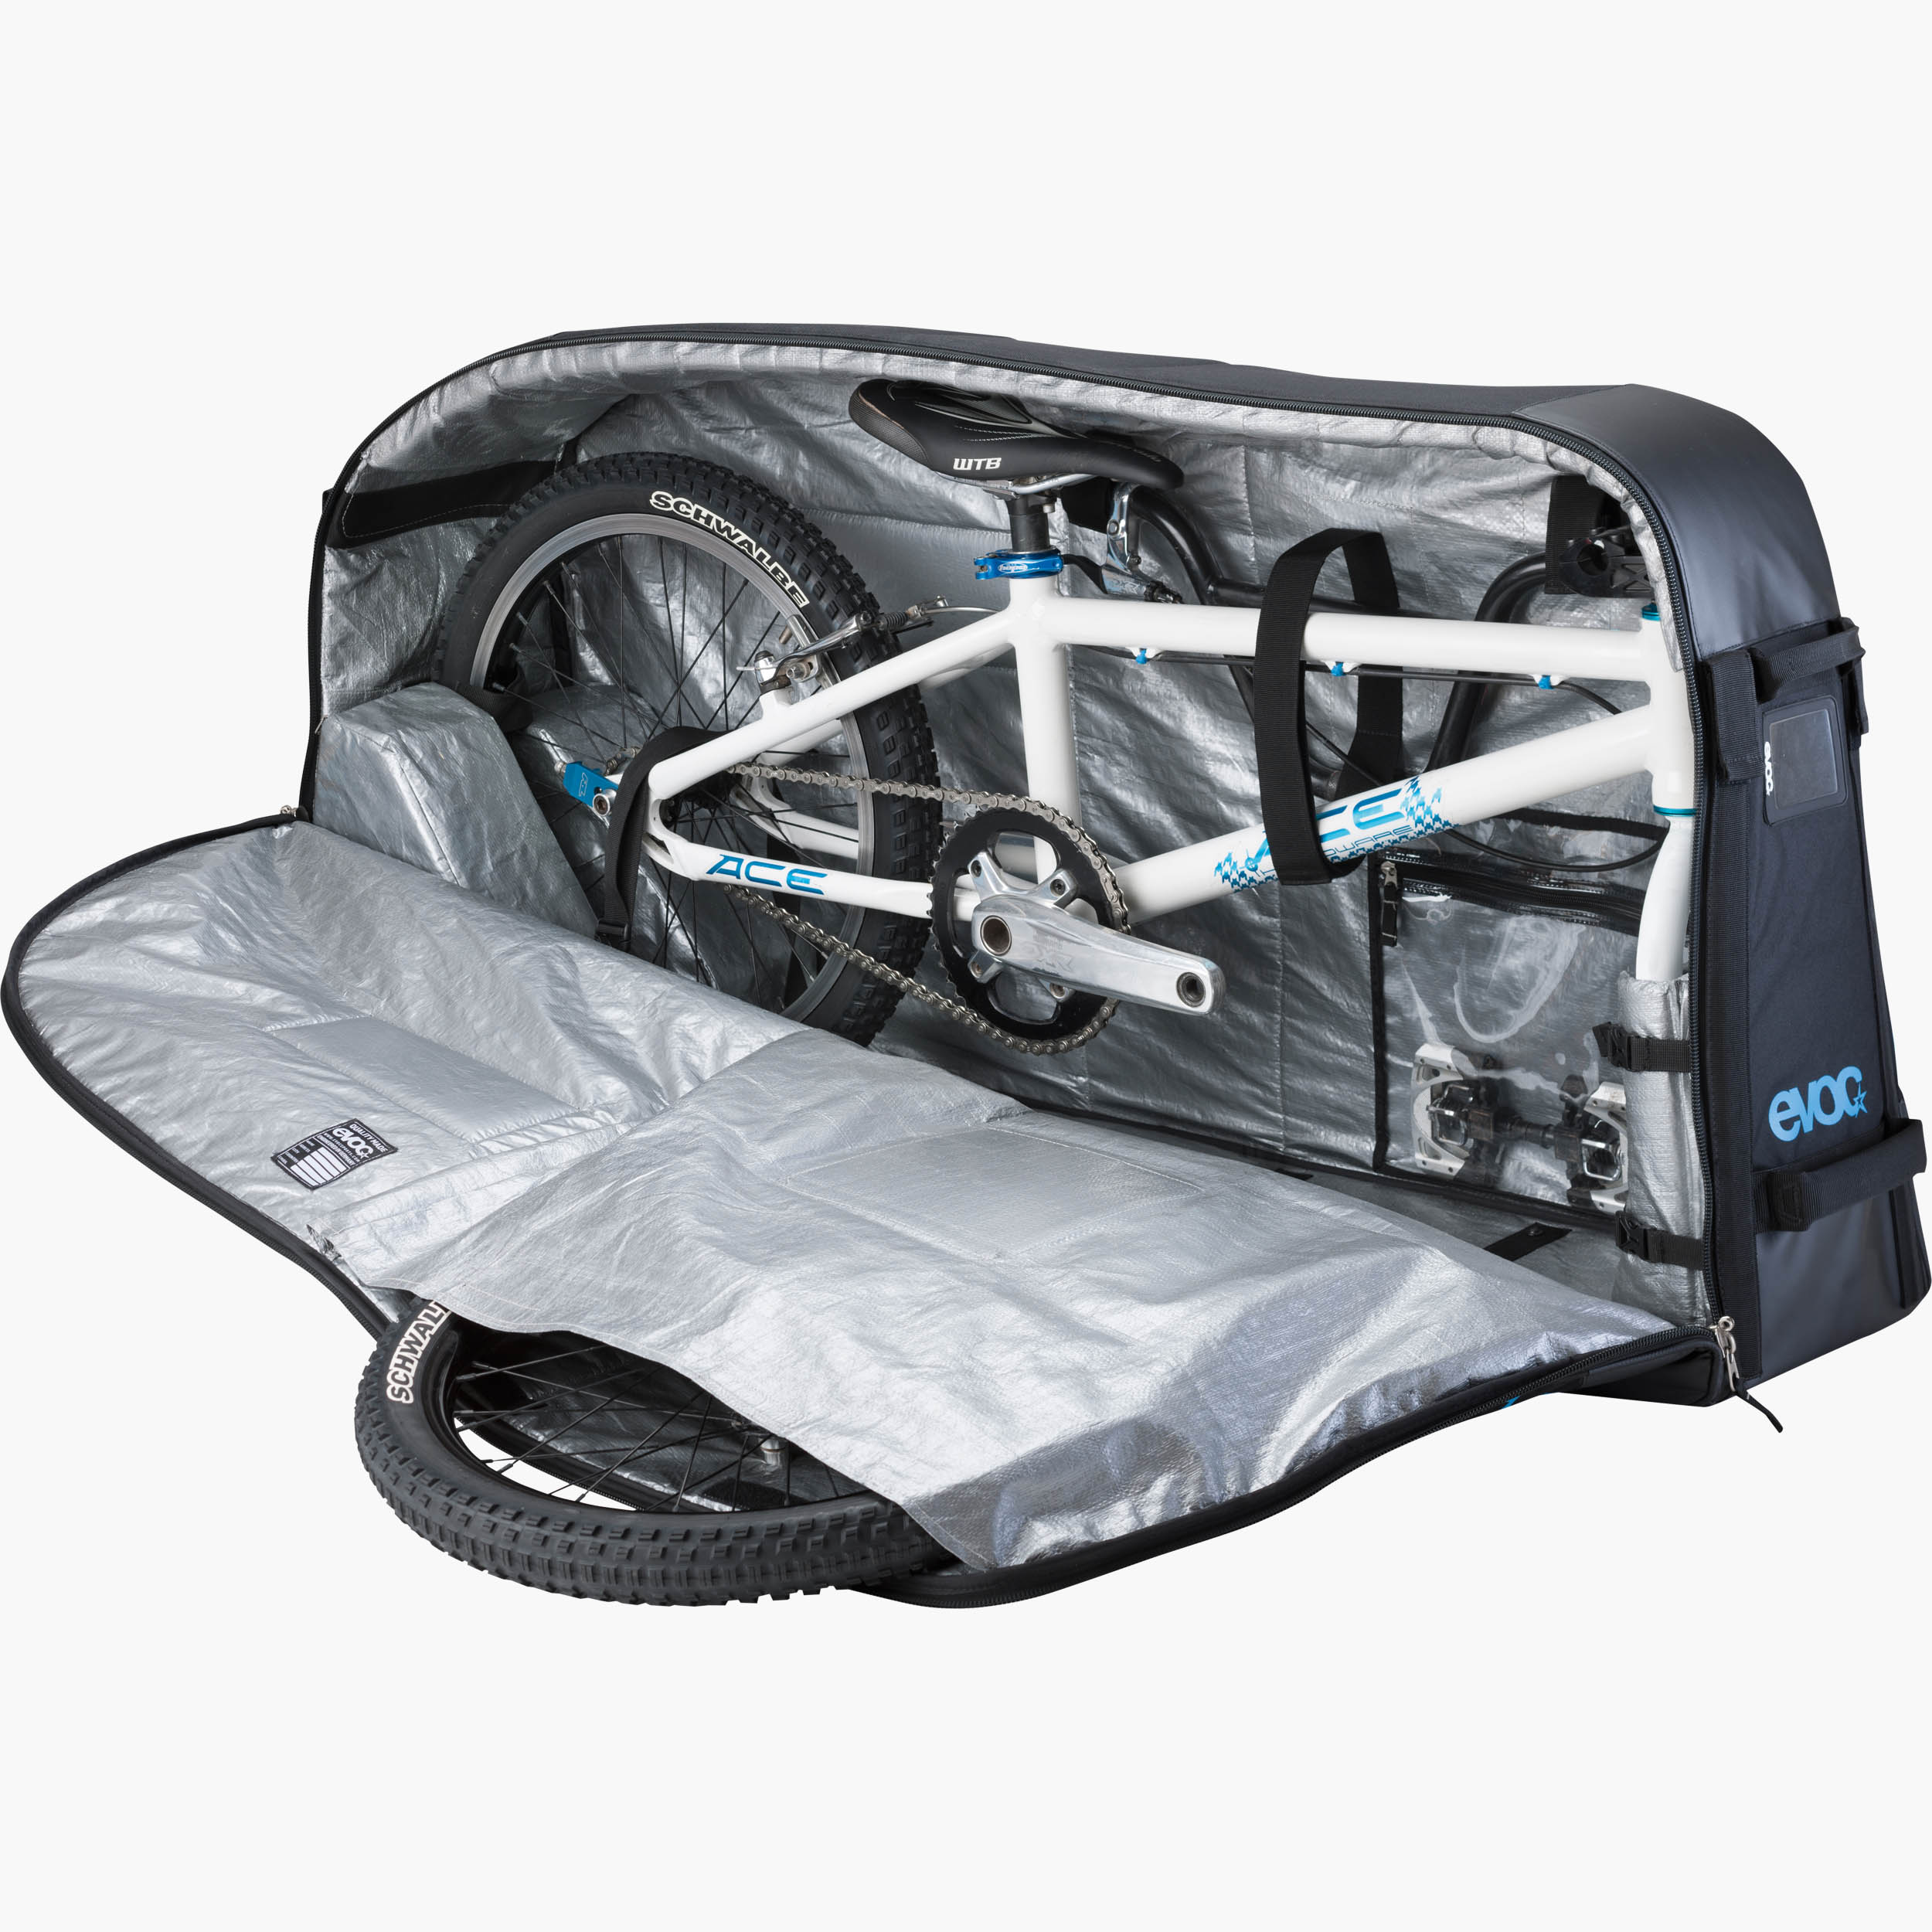 BMX TRAVEL BAG